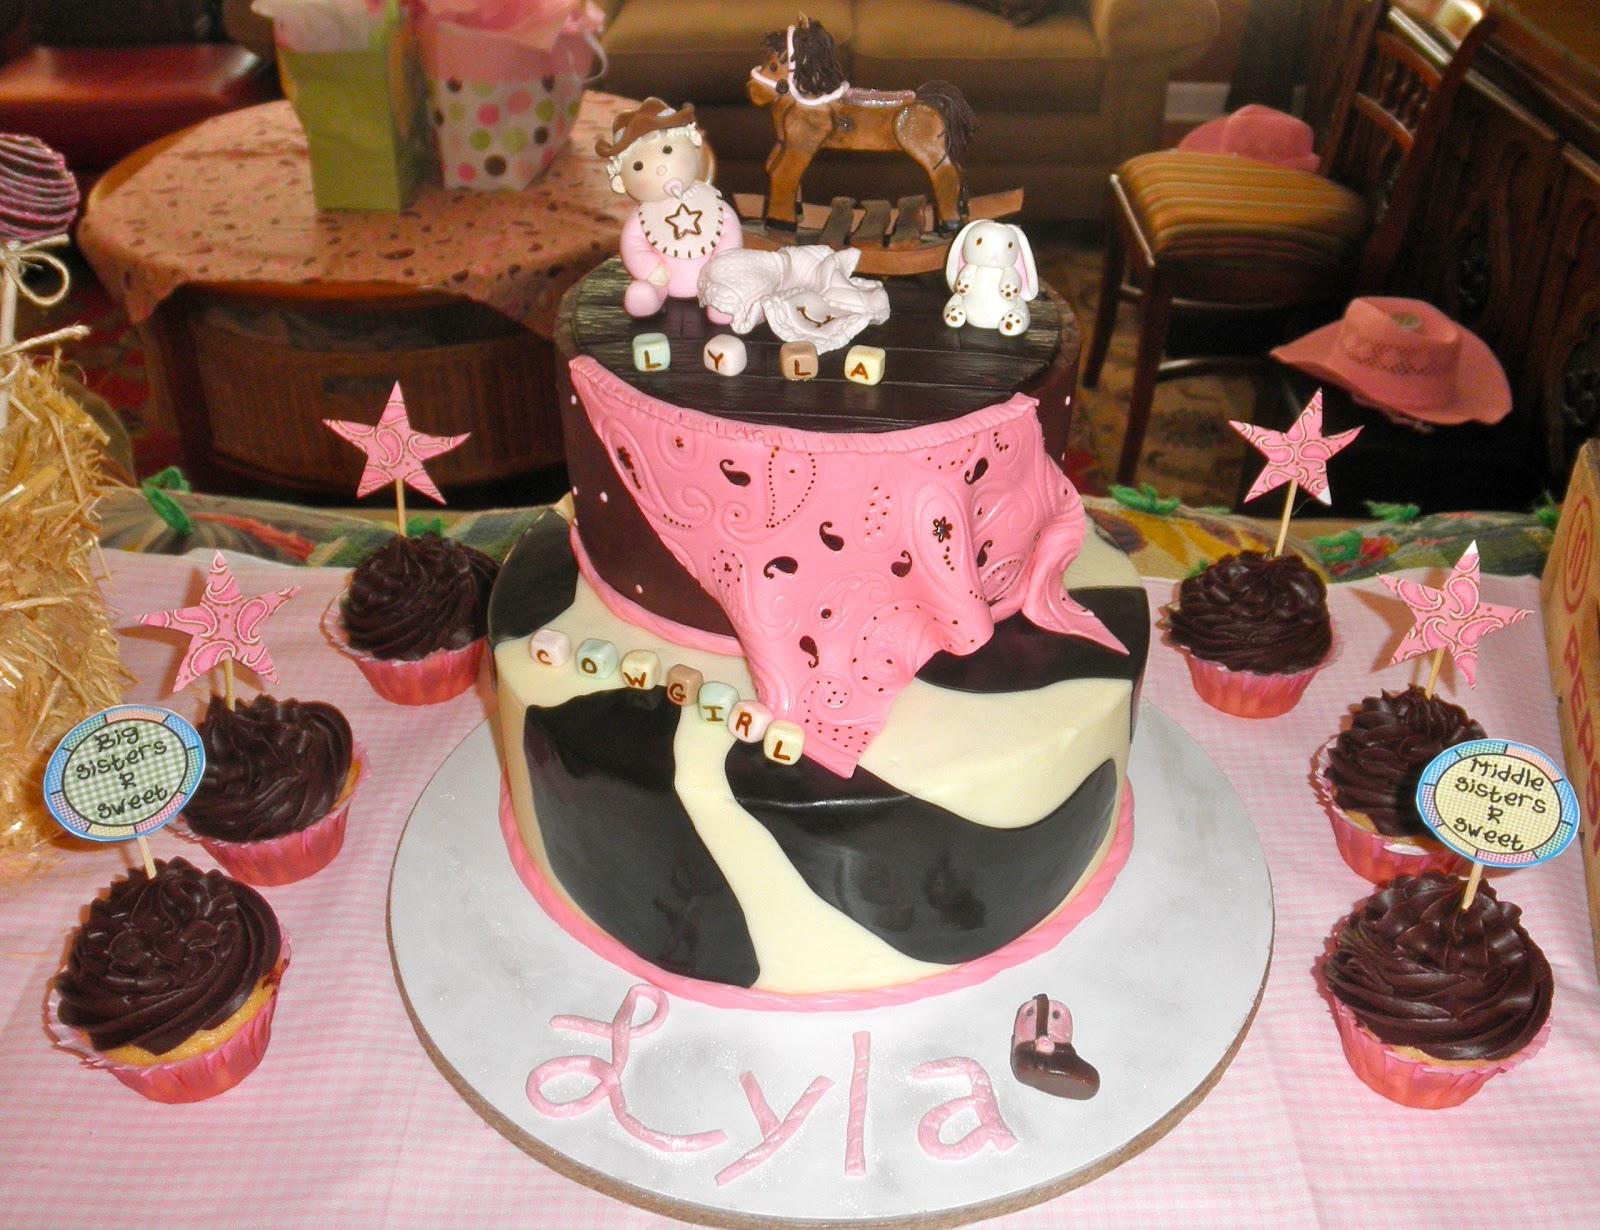 Sweet T\'s Cake Design: 2011-05-15